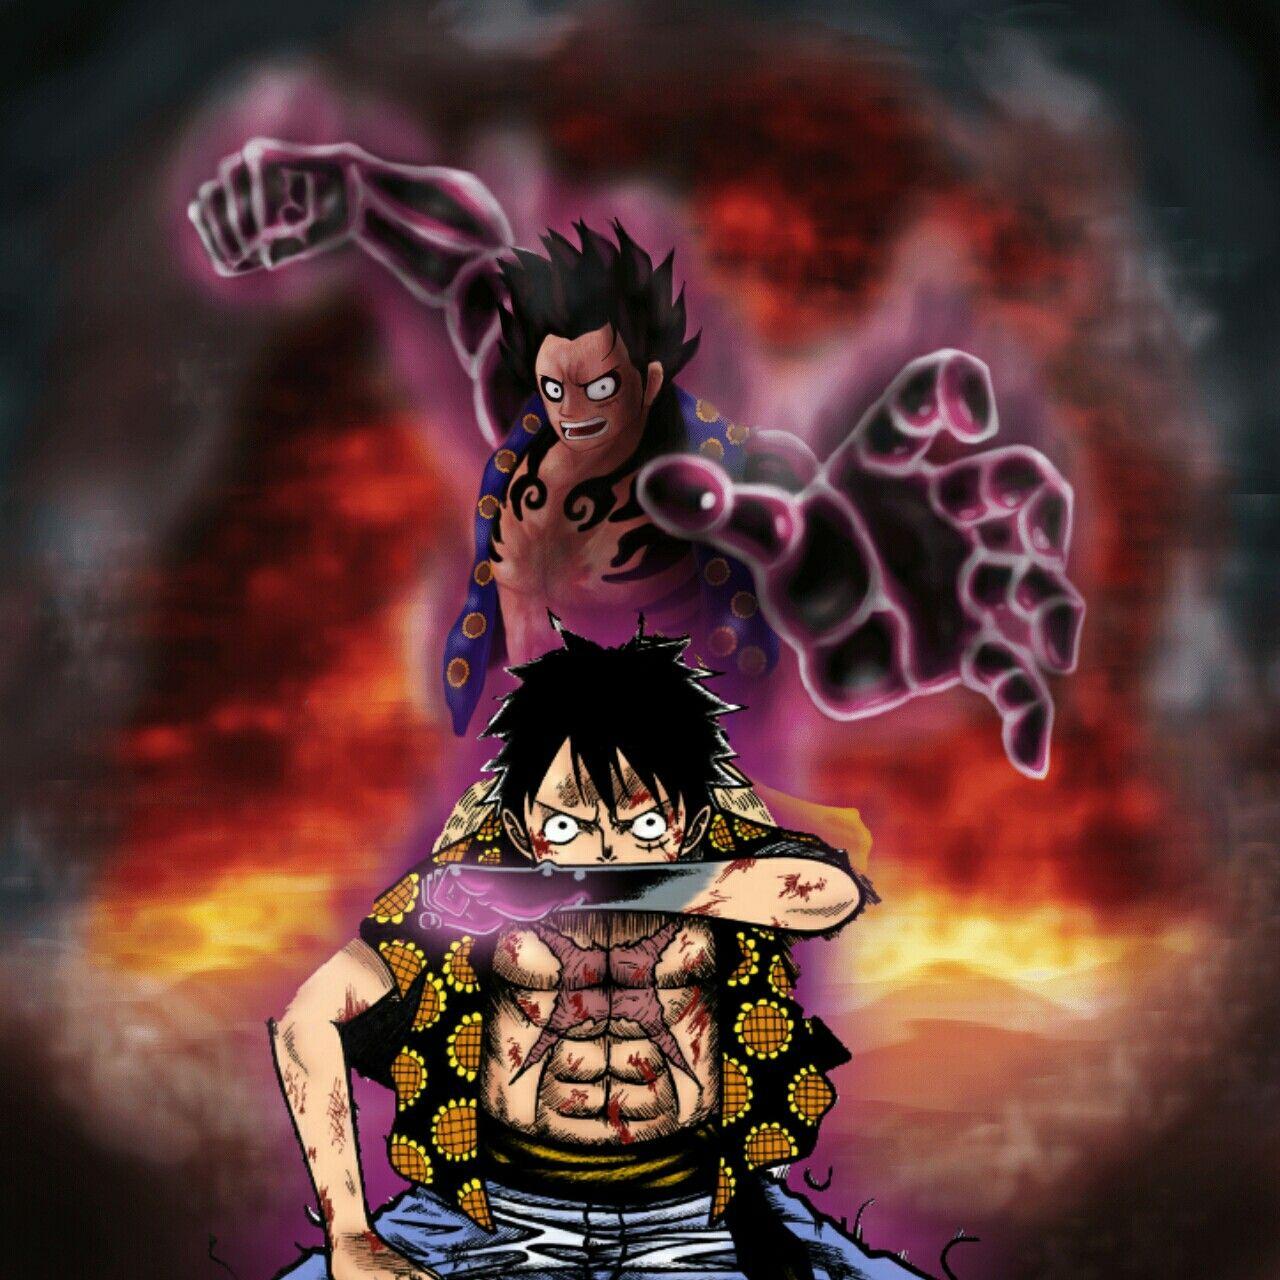 Luffy Gear 4 Luffy Gear 4 Luffy Gear One Piece Luffy